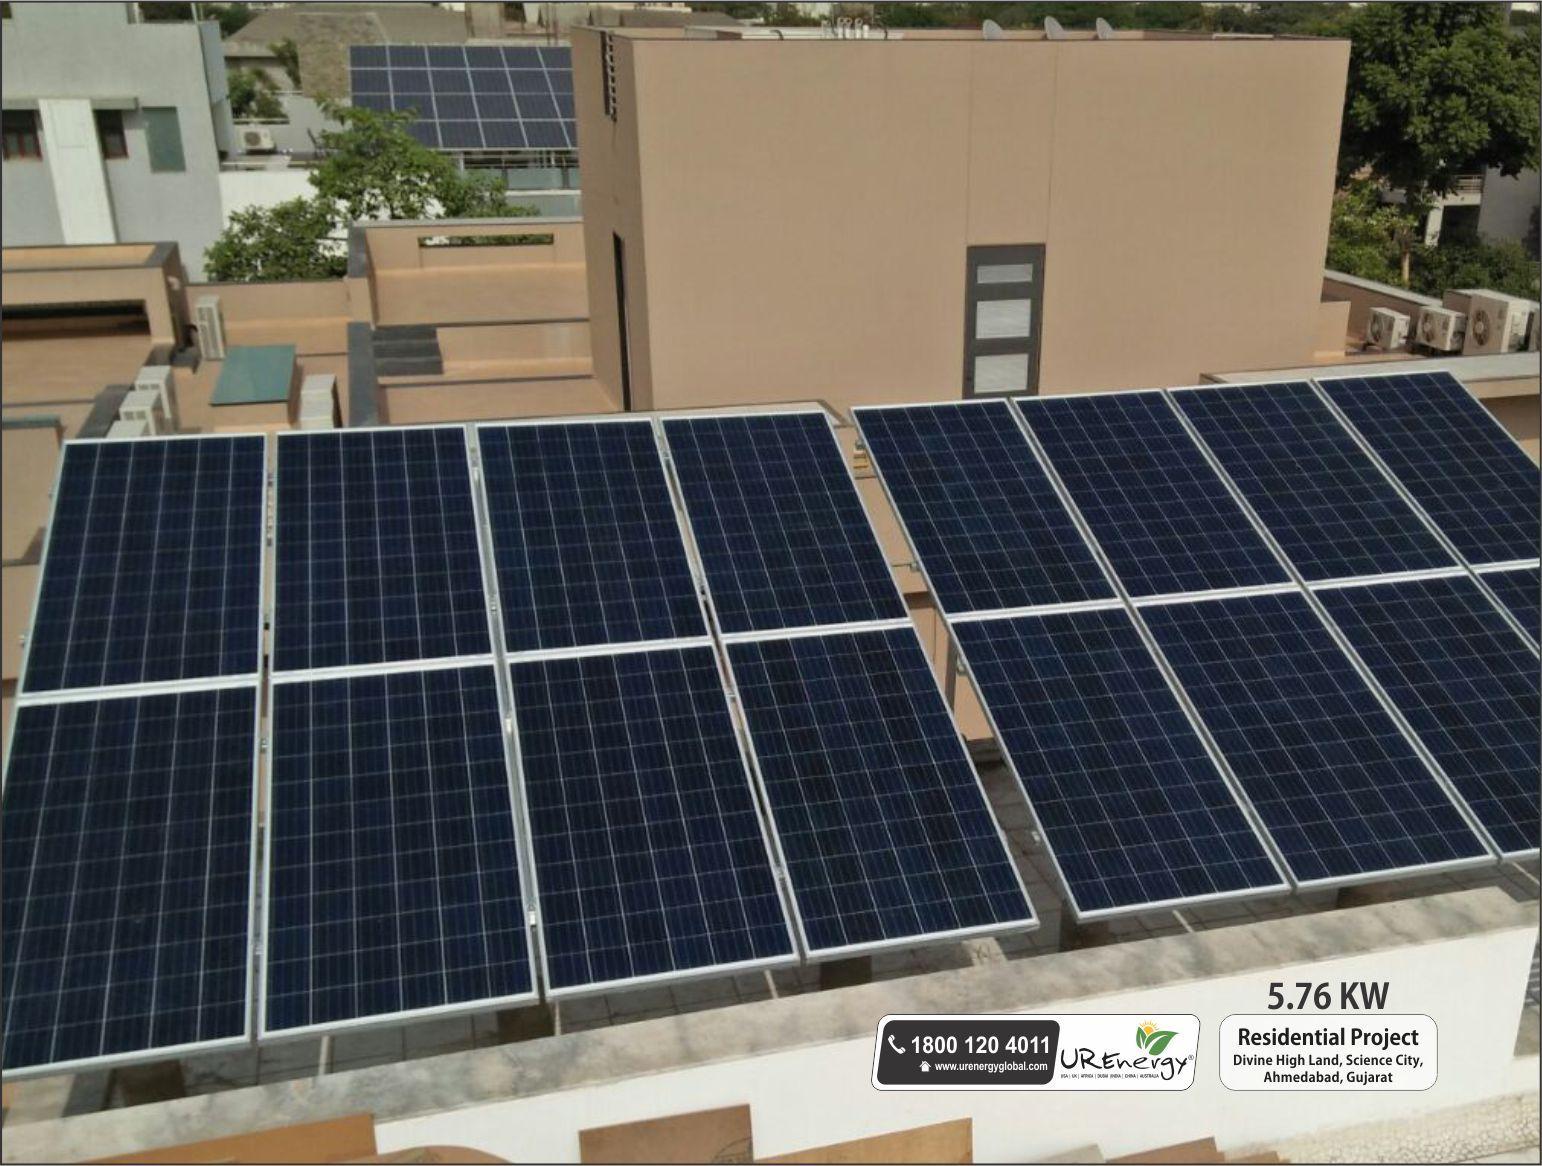 Rooftop Solar Panel Inverters Water Pump Solar Epc Gujarat India U R Energy Solar Solar Panels Solar Projects